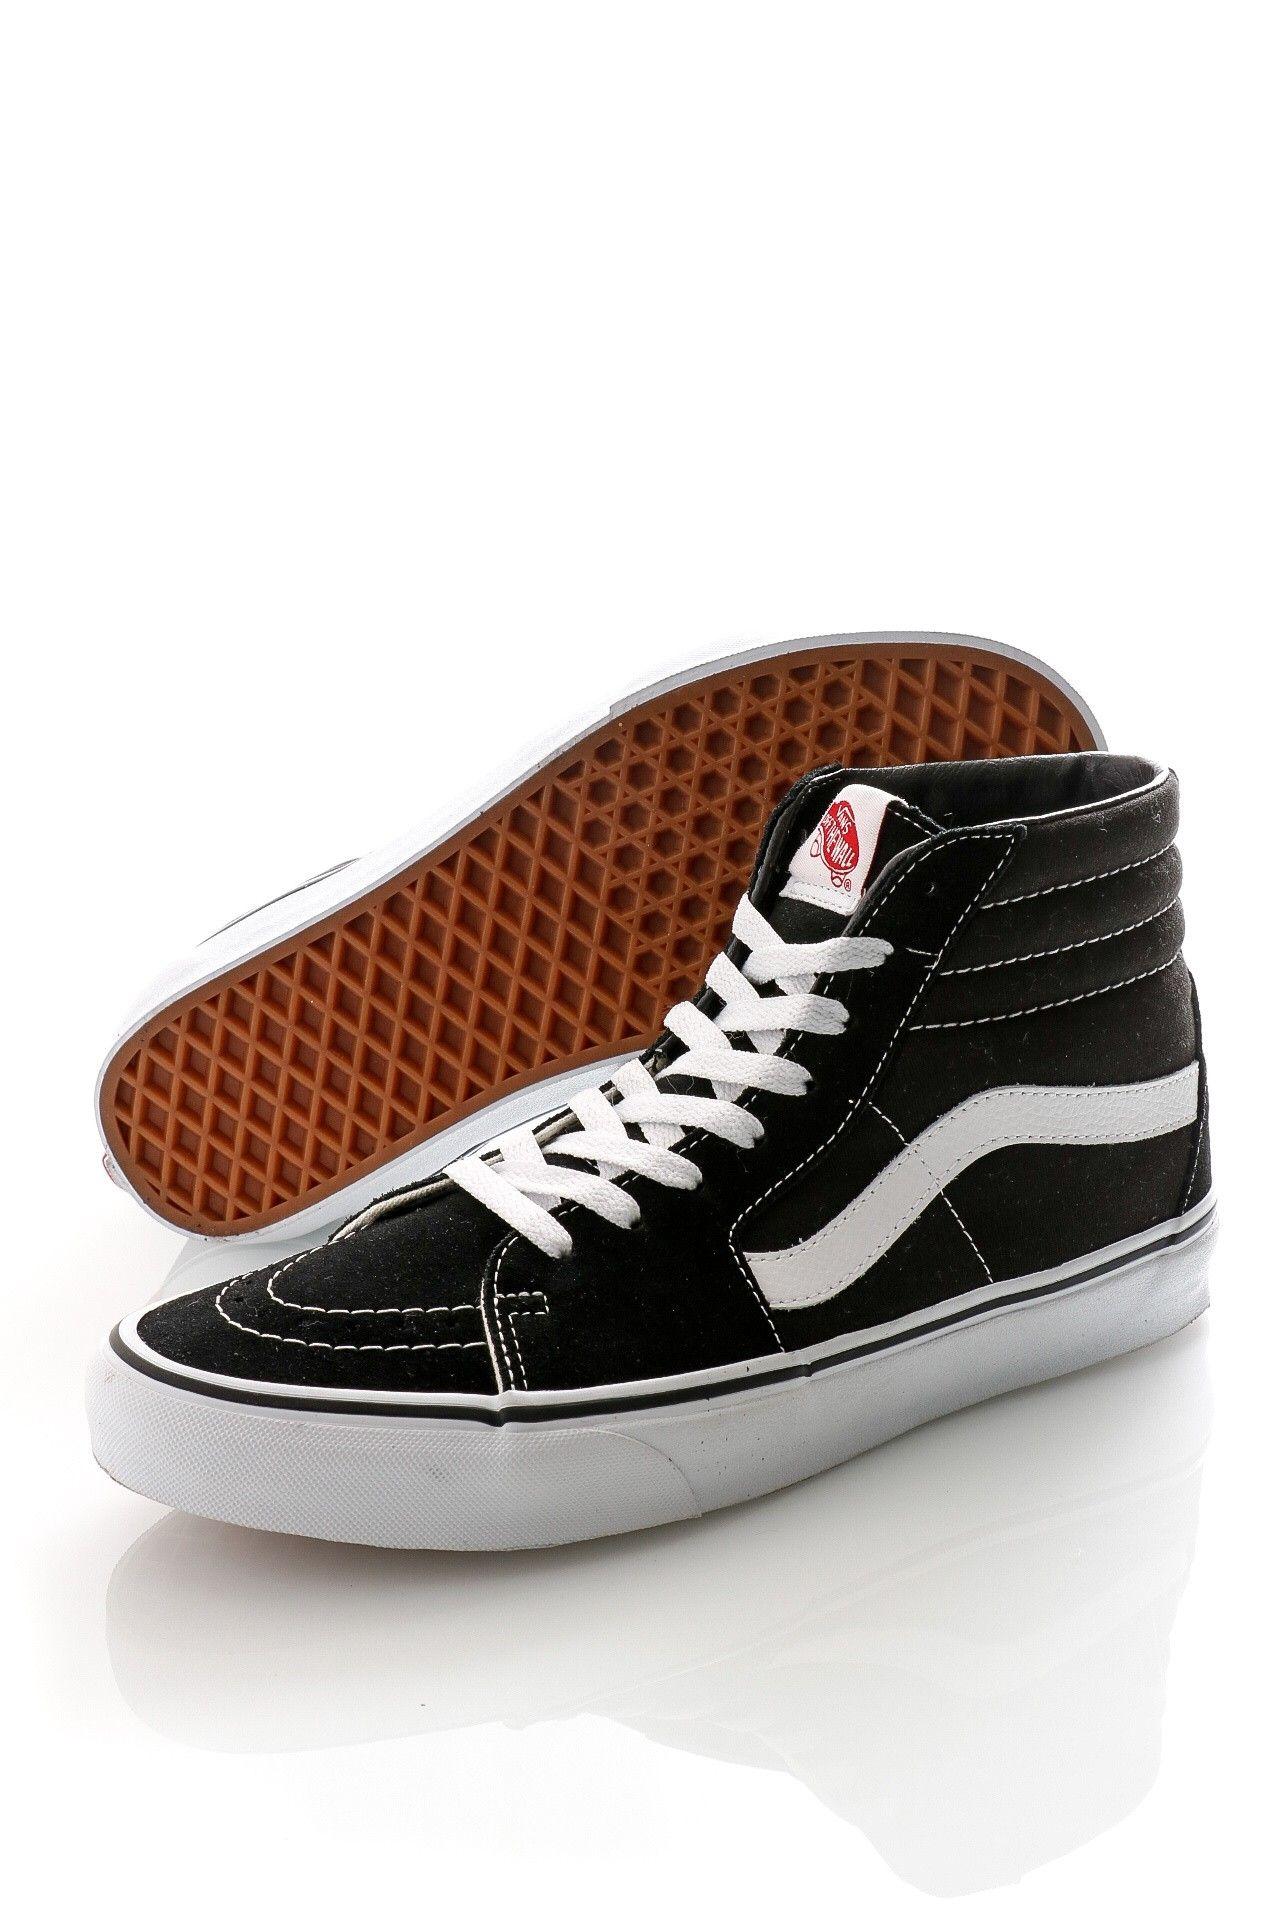 Afbeelding van Vans Classics Sneakers Sk8-Hi Black/White VN000D5IB8C1